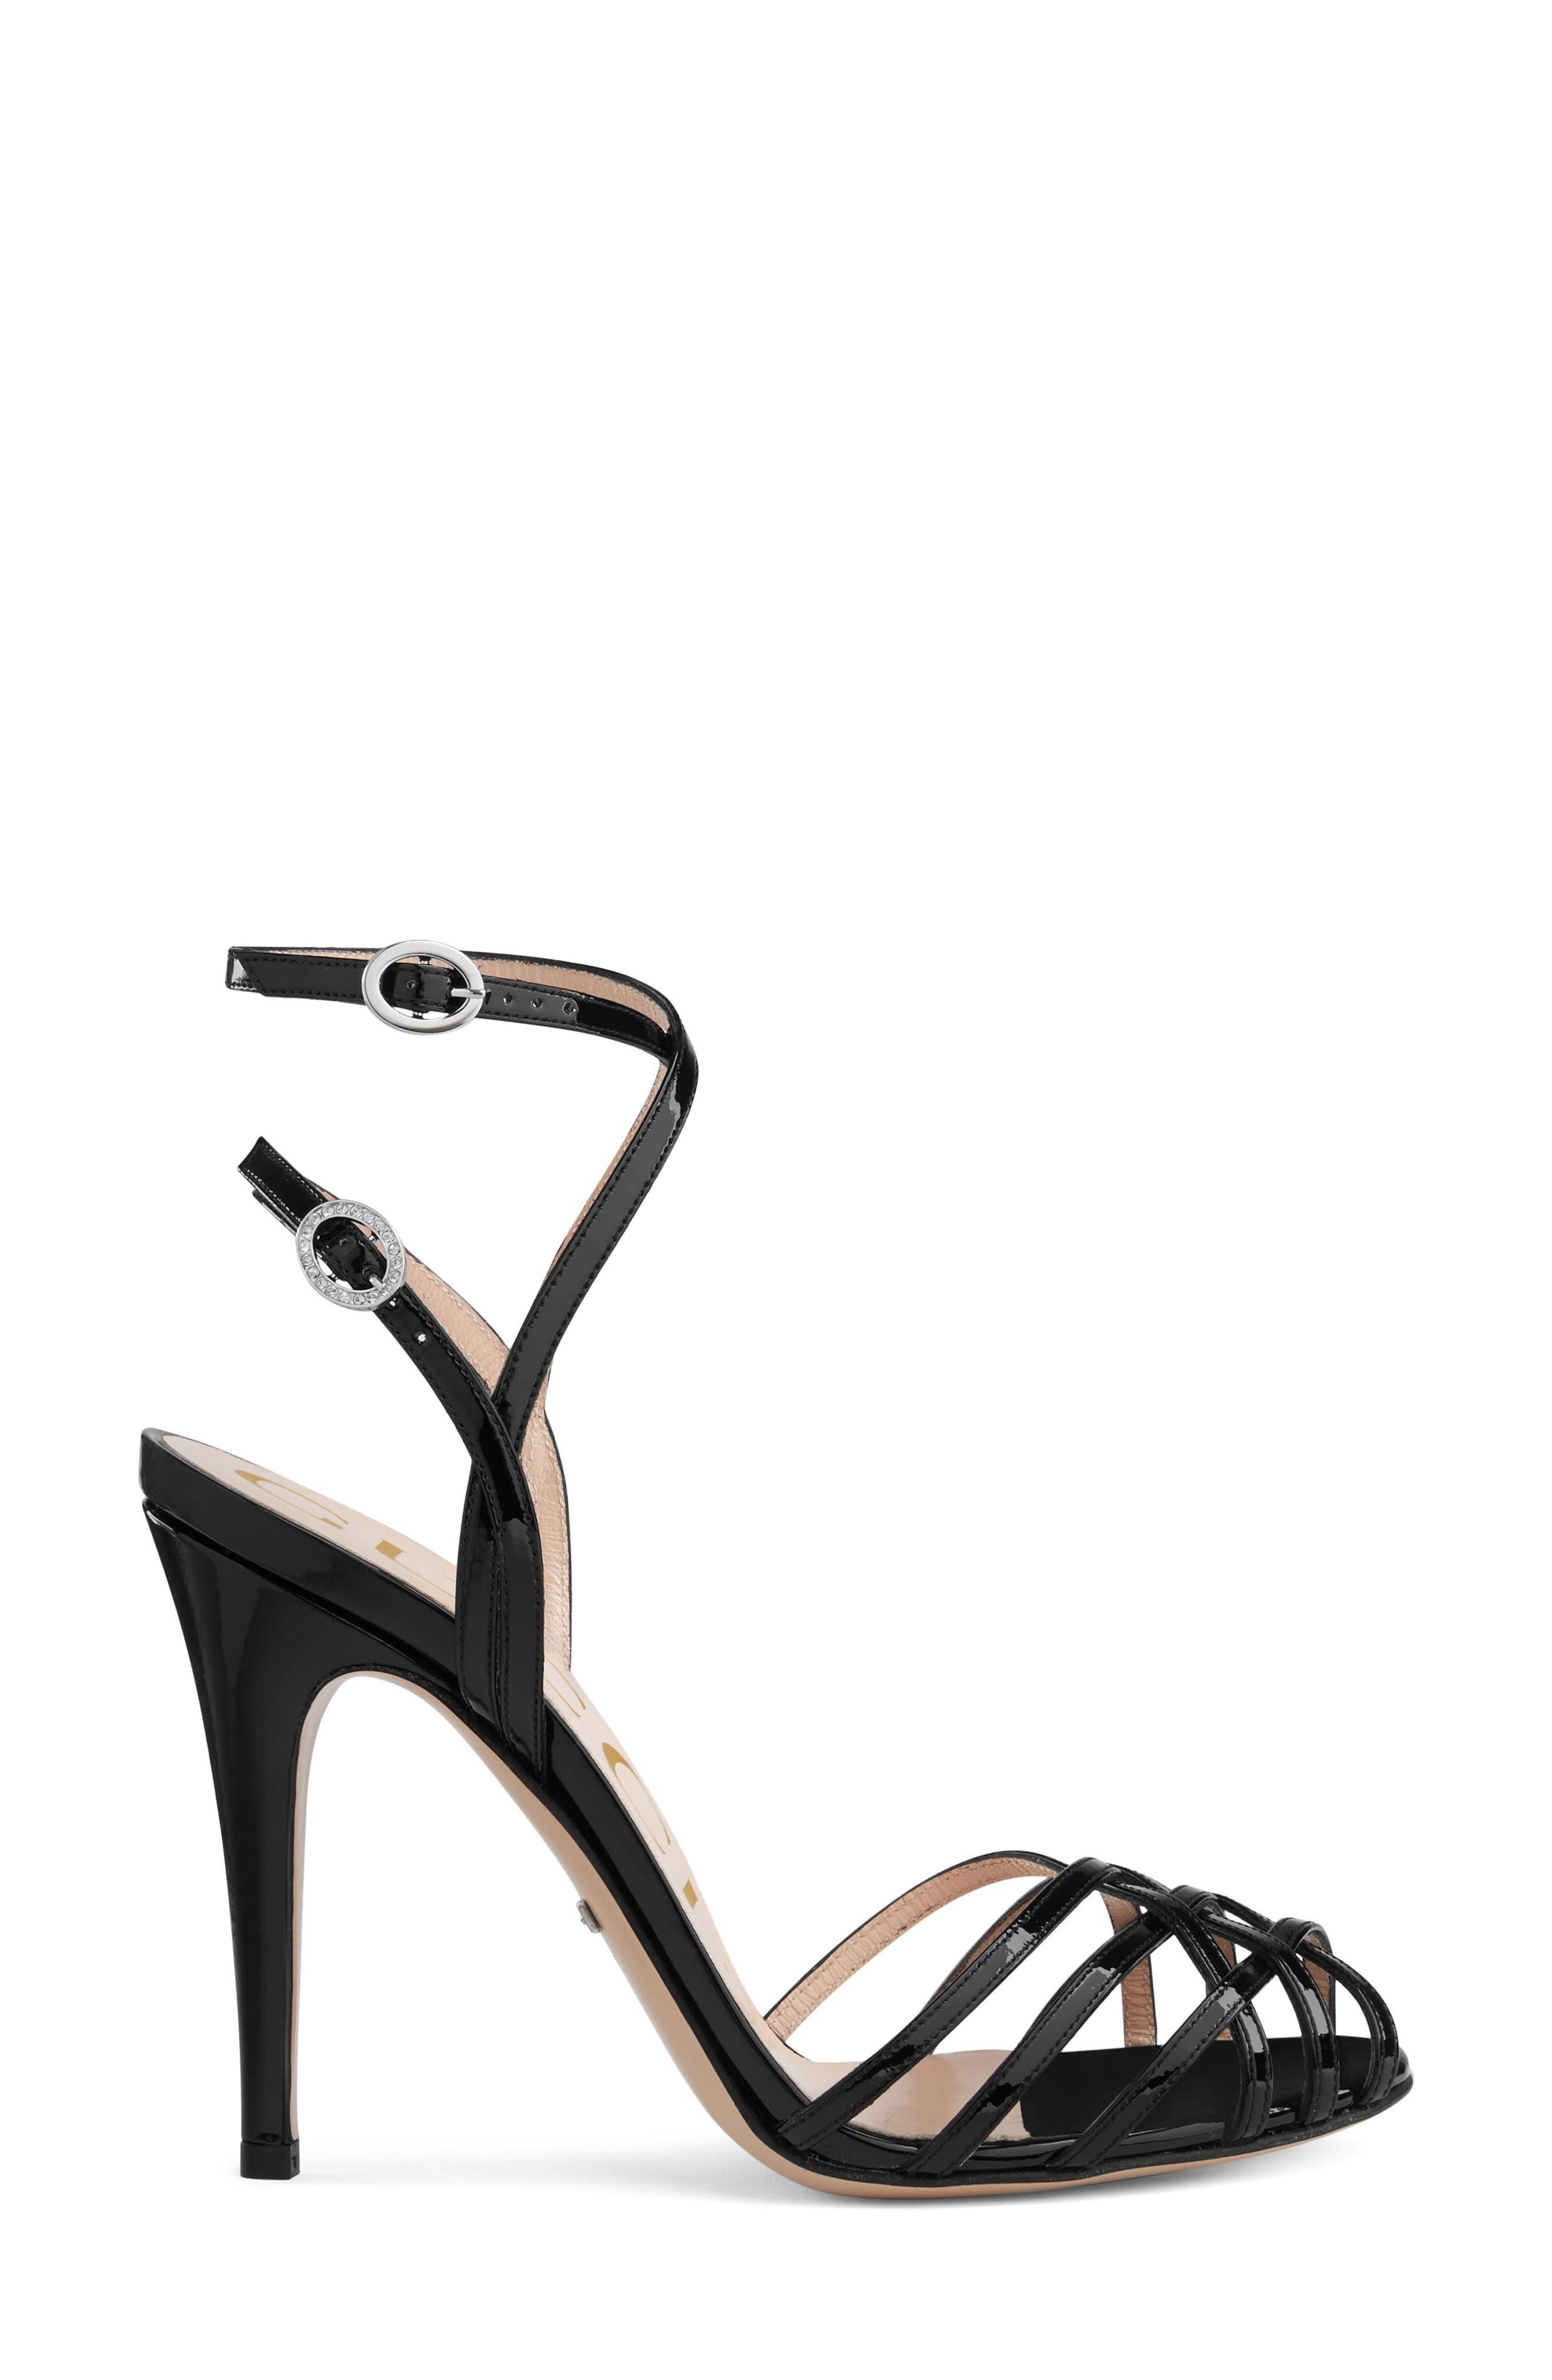 GUCCI, Draconia Ankle Strap Sandal, Alternate thumbnail 3, color, BLACK